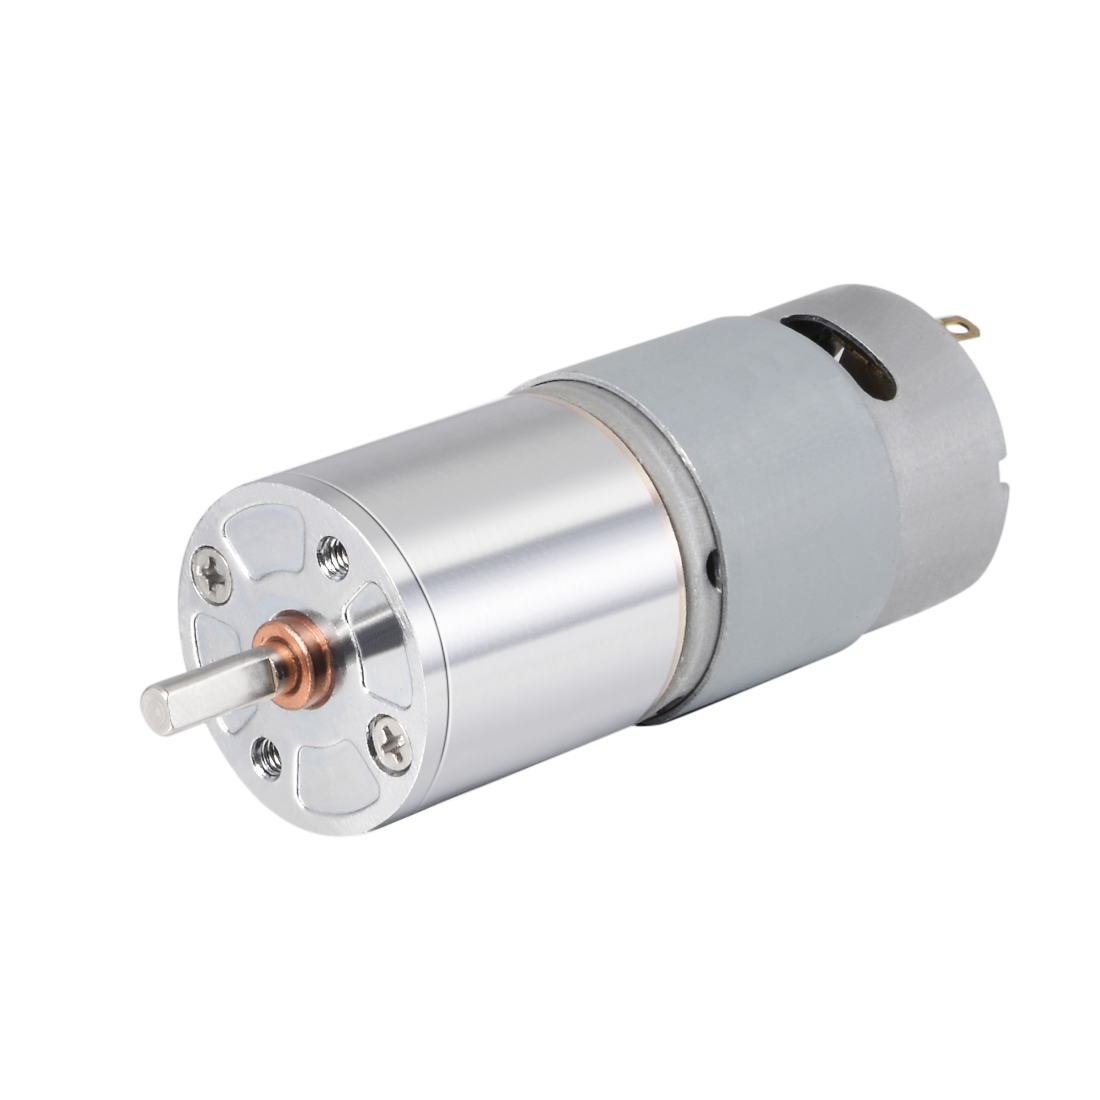 12V DC 30 RPM Gear Motor High Torque Reduction Gearbox Centric Output D-Shaft